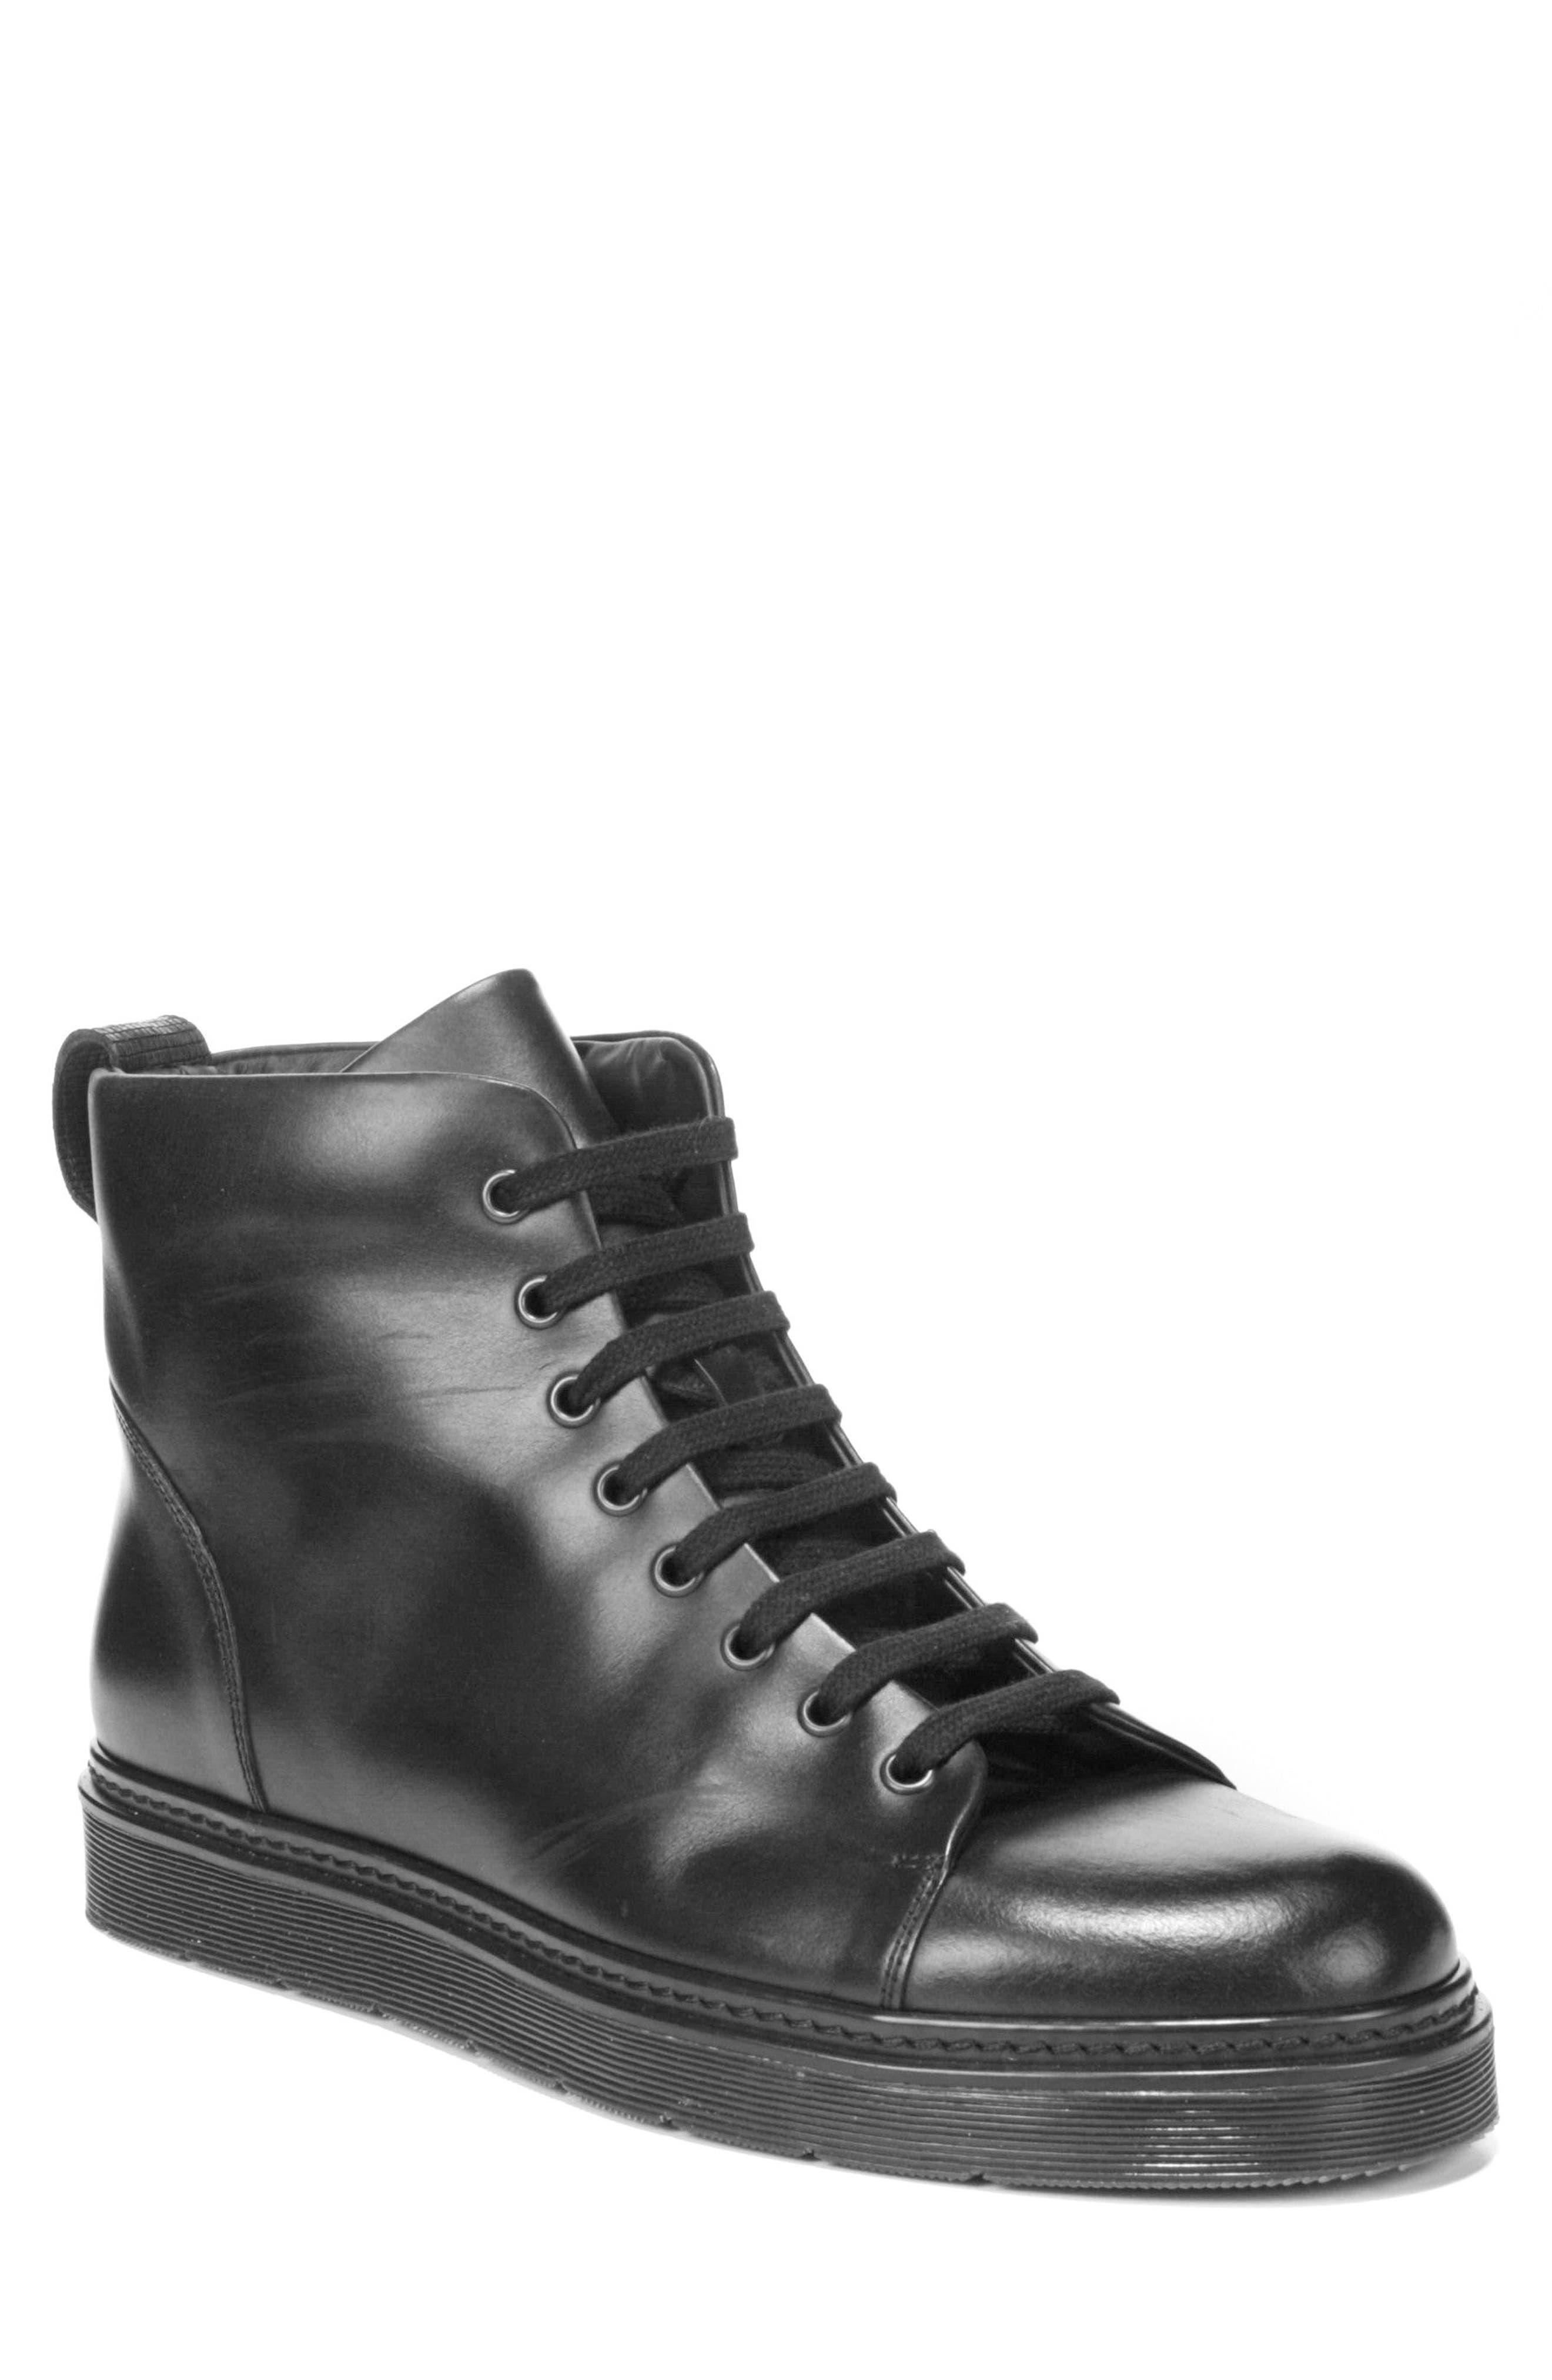 Malone Plain Toe Boot,                         Main,                         color, Black